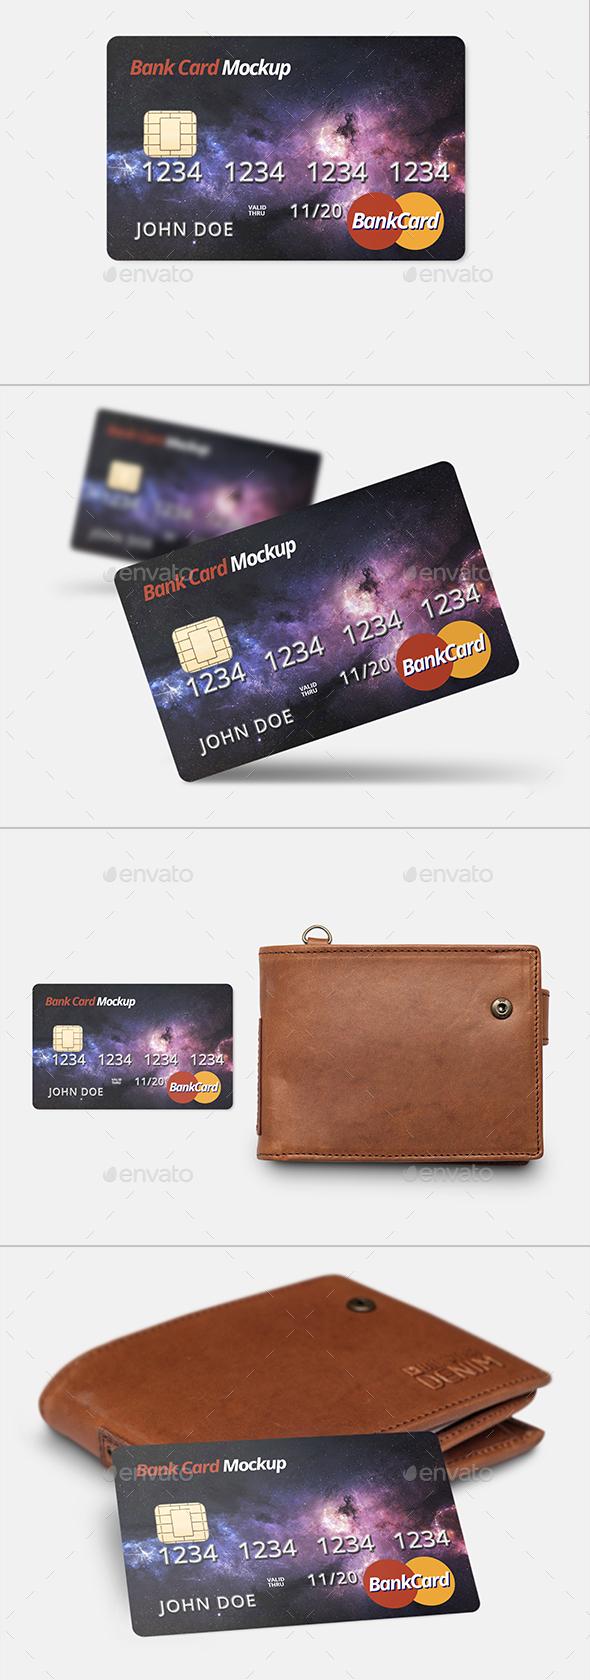 43 Photorealistic Credit Card Mockups 2020 Psd Vector Download